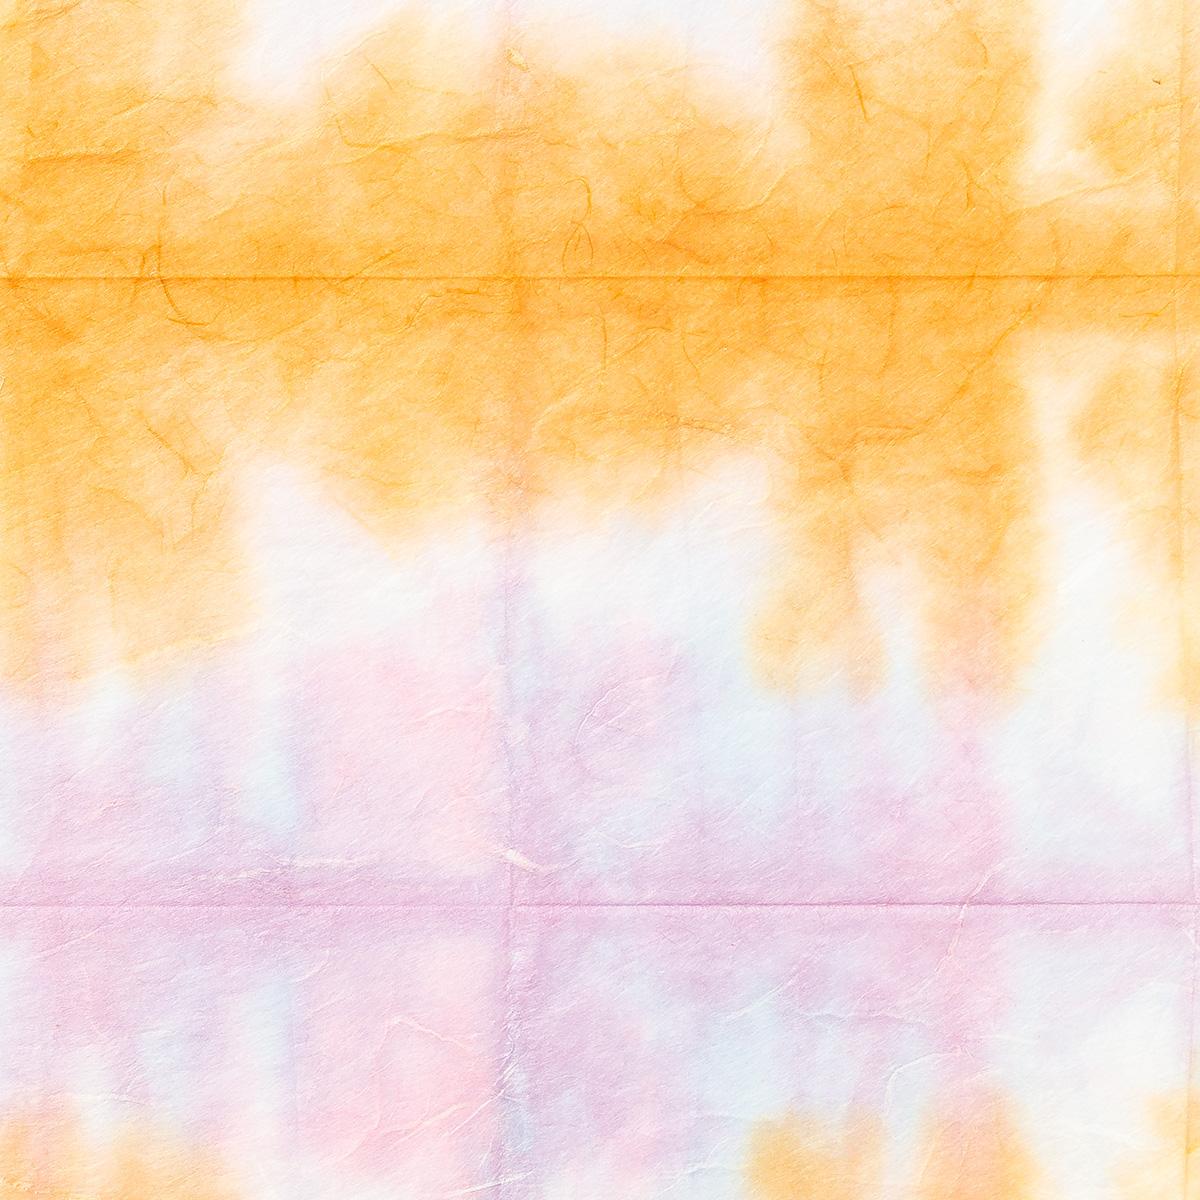 楮6匁 雲竜紙 板締め No.8